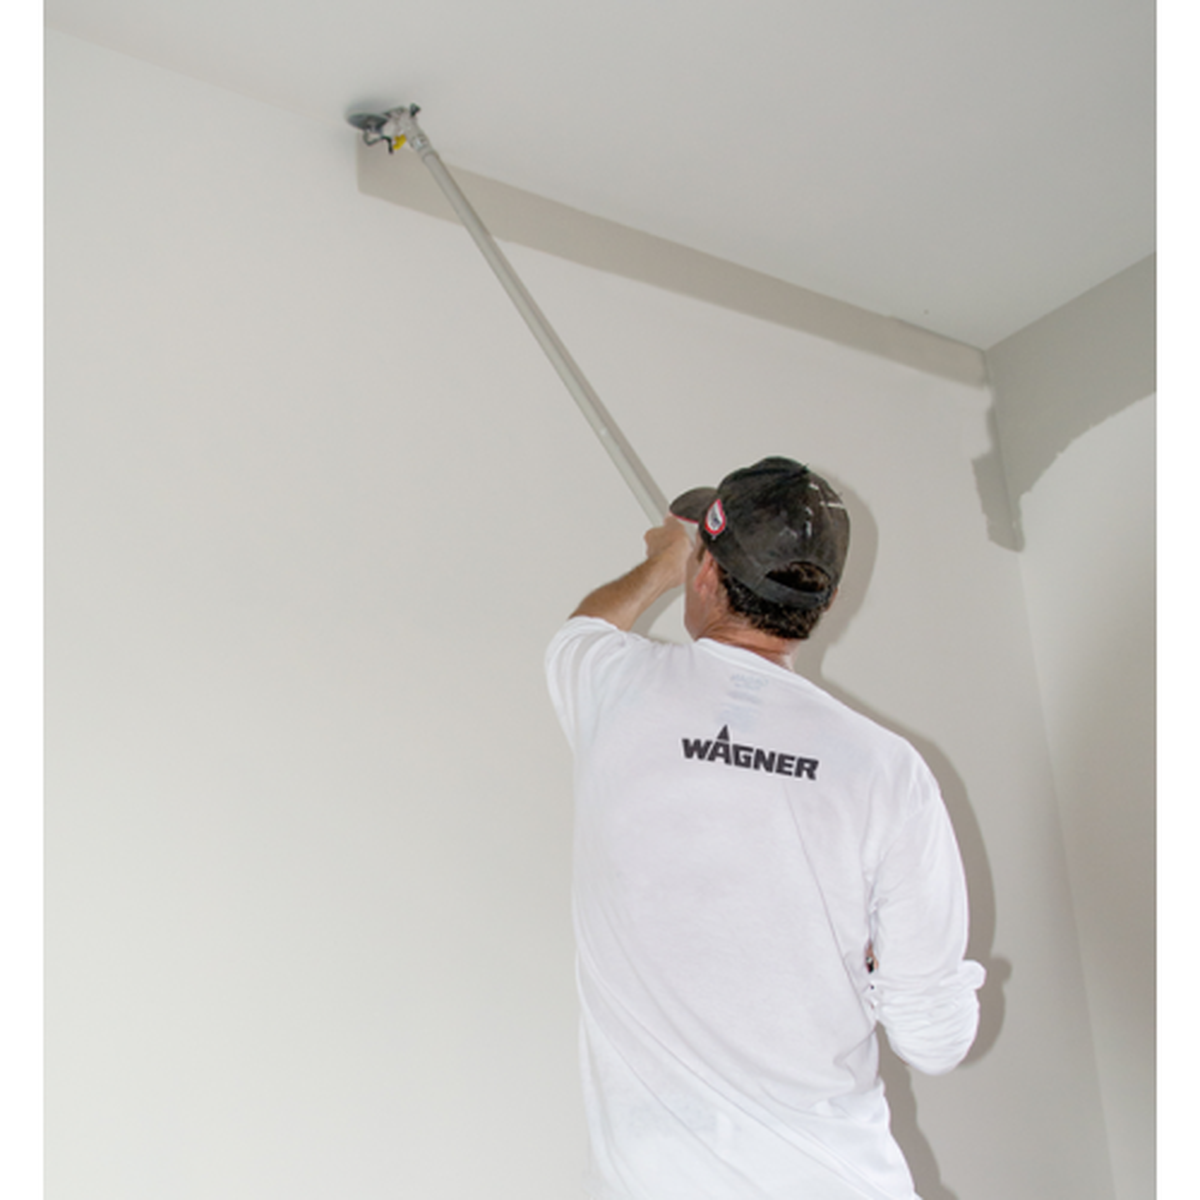 Wagner SpeedShield – masking-free spray painting